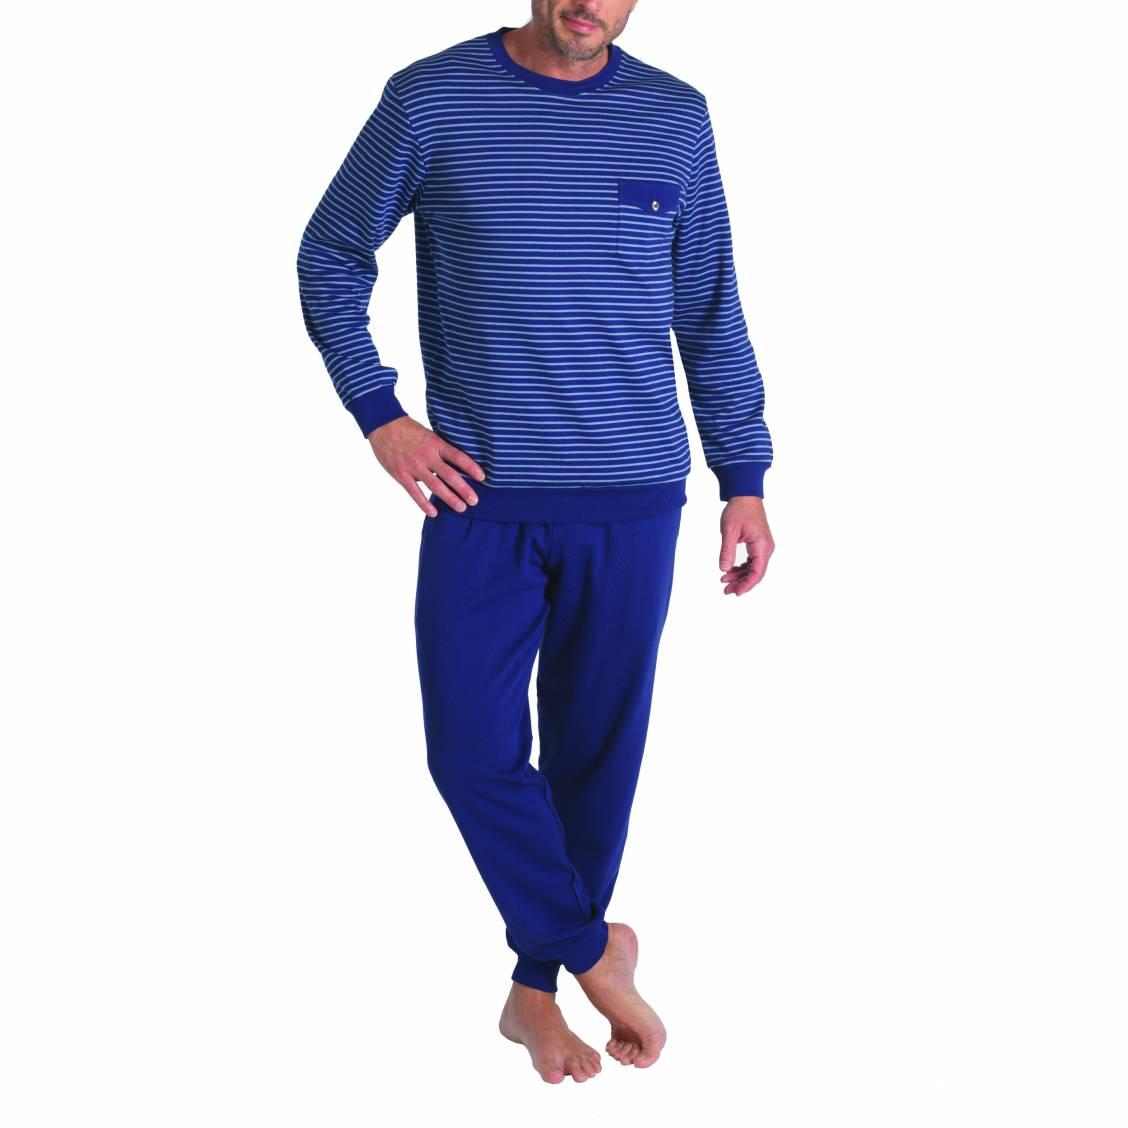 pyjama long eminence en coton haut col rond ray bleu marine et bleu clair pantalon jogging. Black Bedroom Furniture Sets. Home Design Ideas